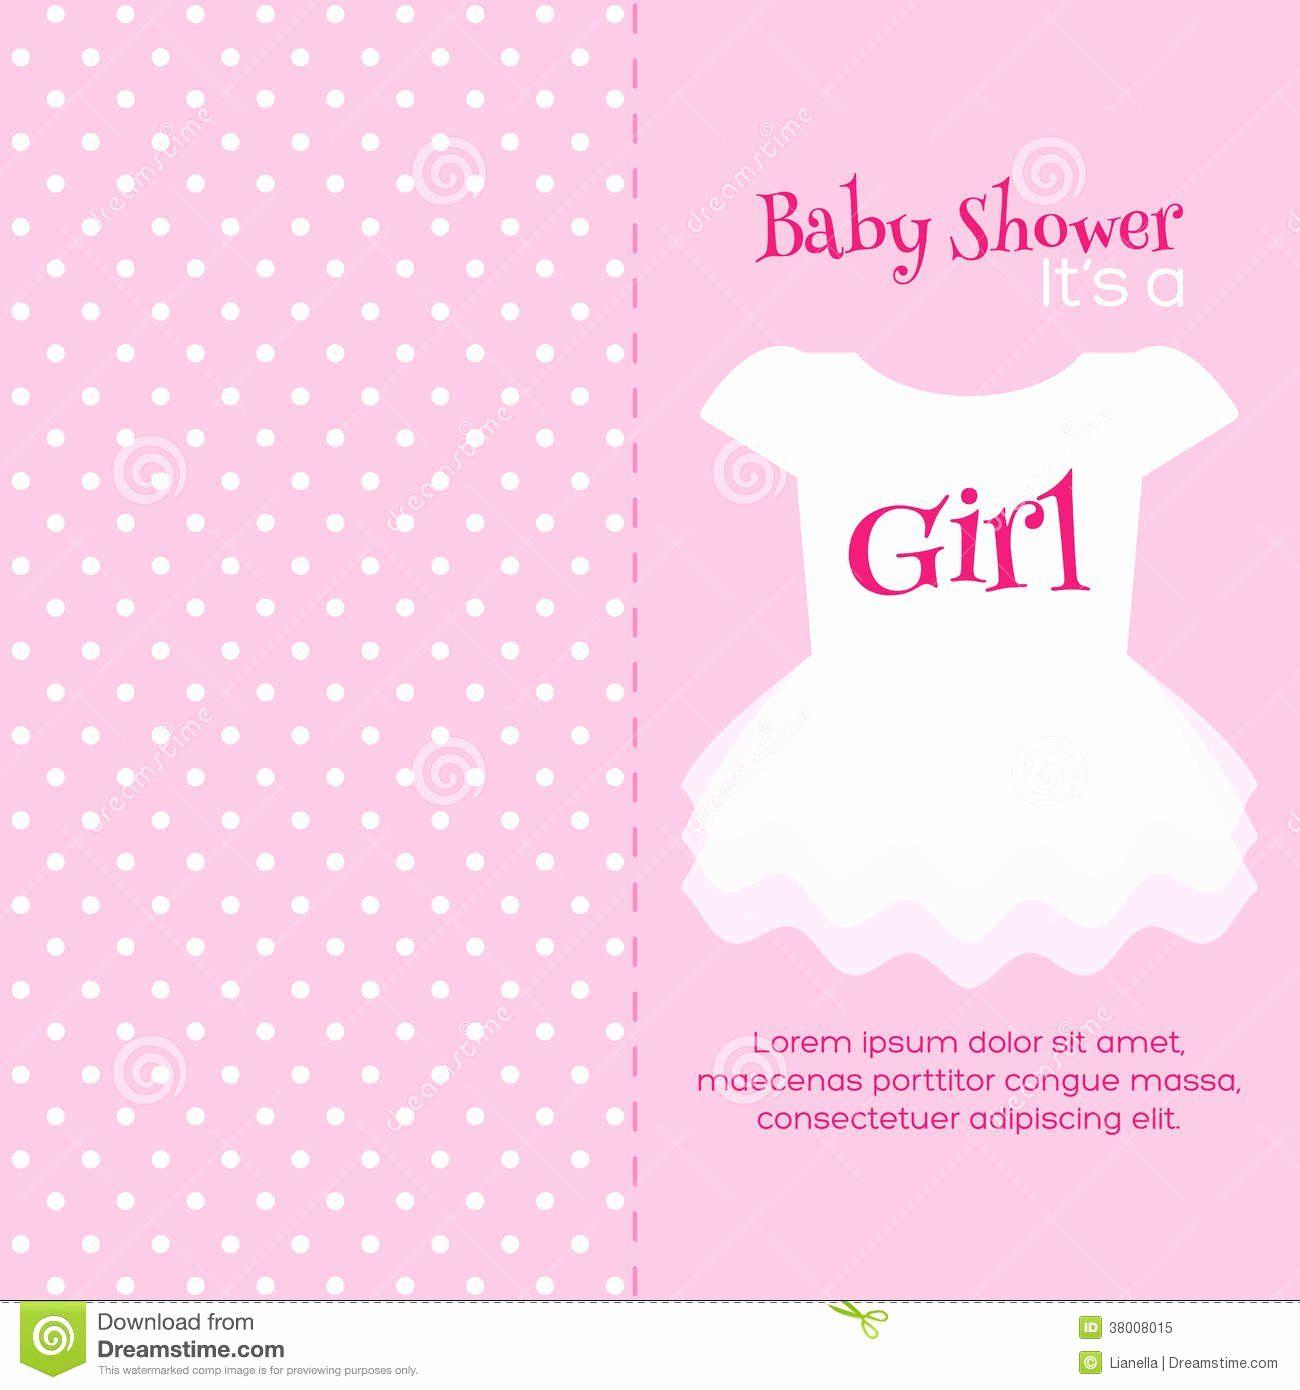 20 Baby Shower Invitation Background Free Baby Shower Invitations Baby Shower Invitation Cards Pink Baby Shower Invitations